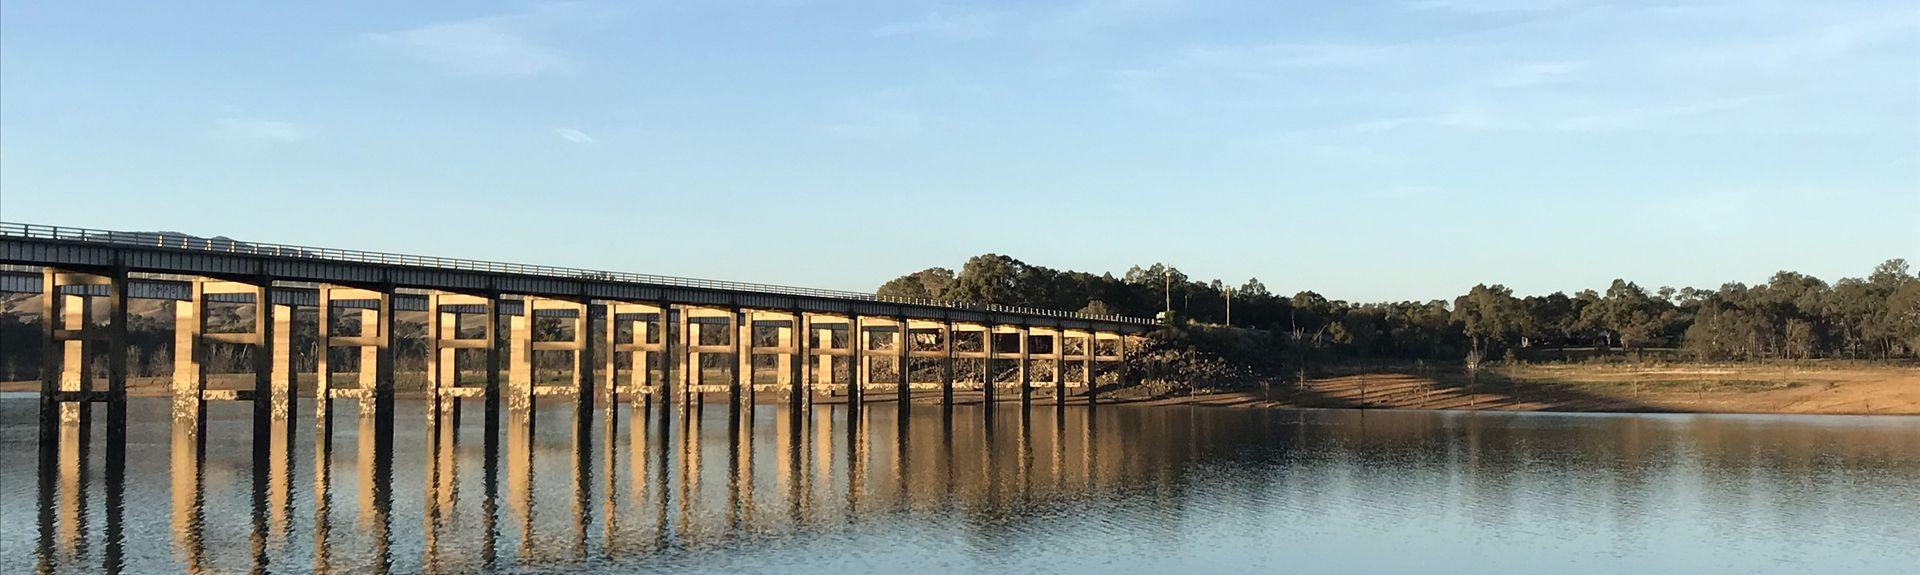 Comté de Murrindindi, Victoria, Australie